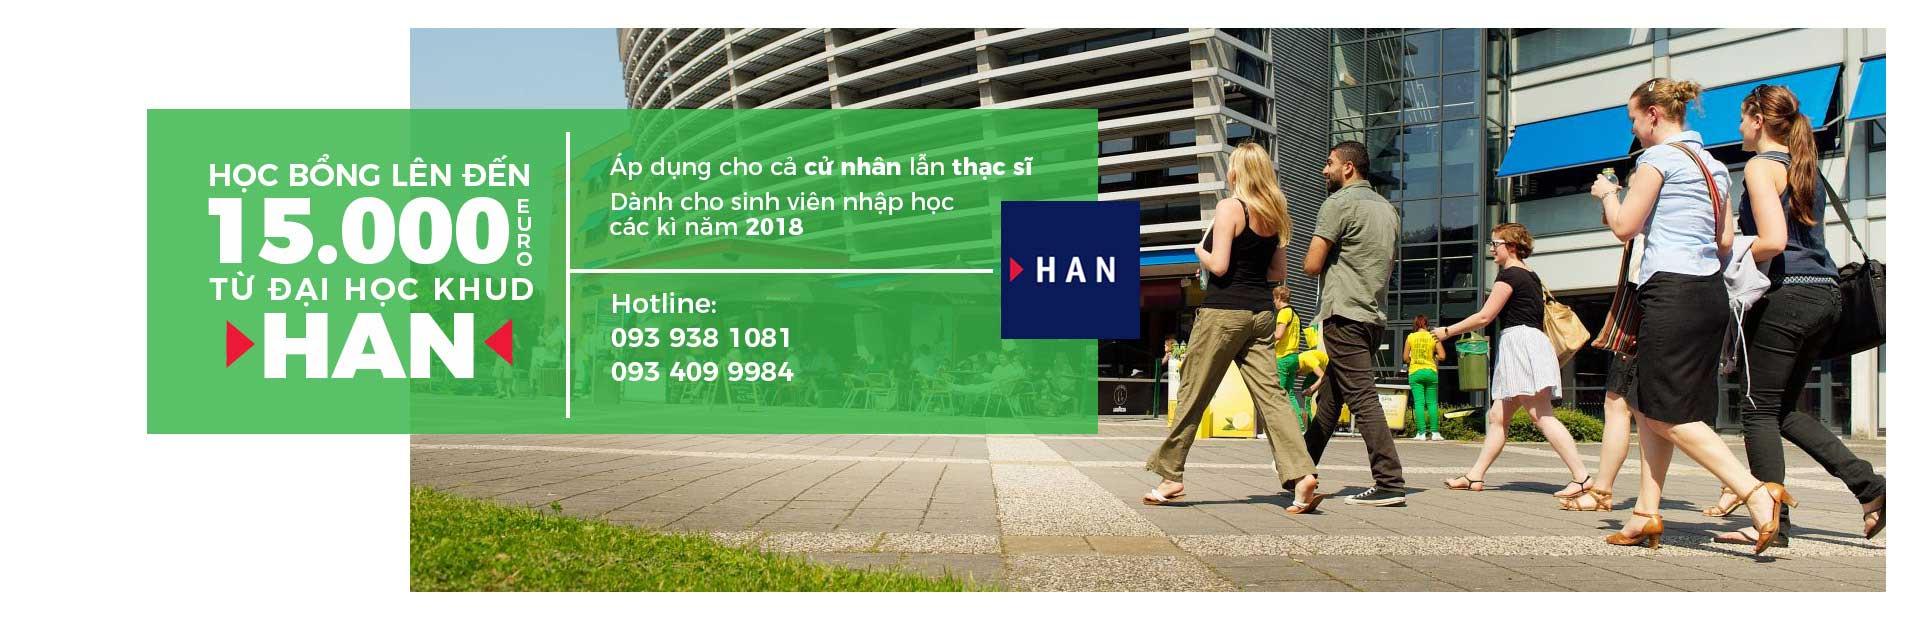 HAN hoc bong